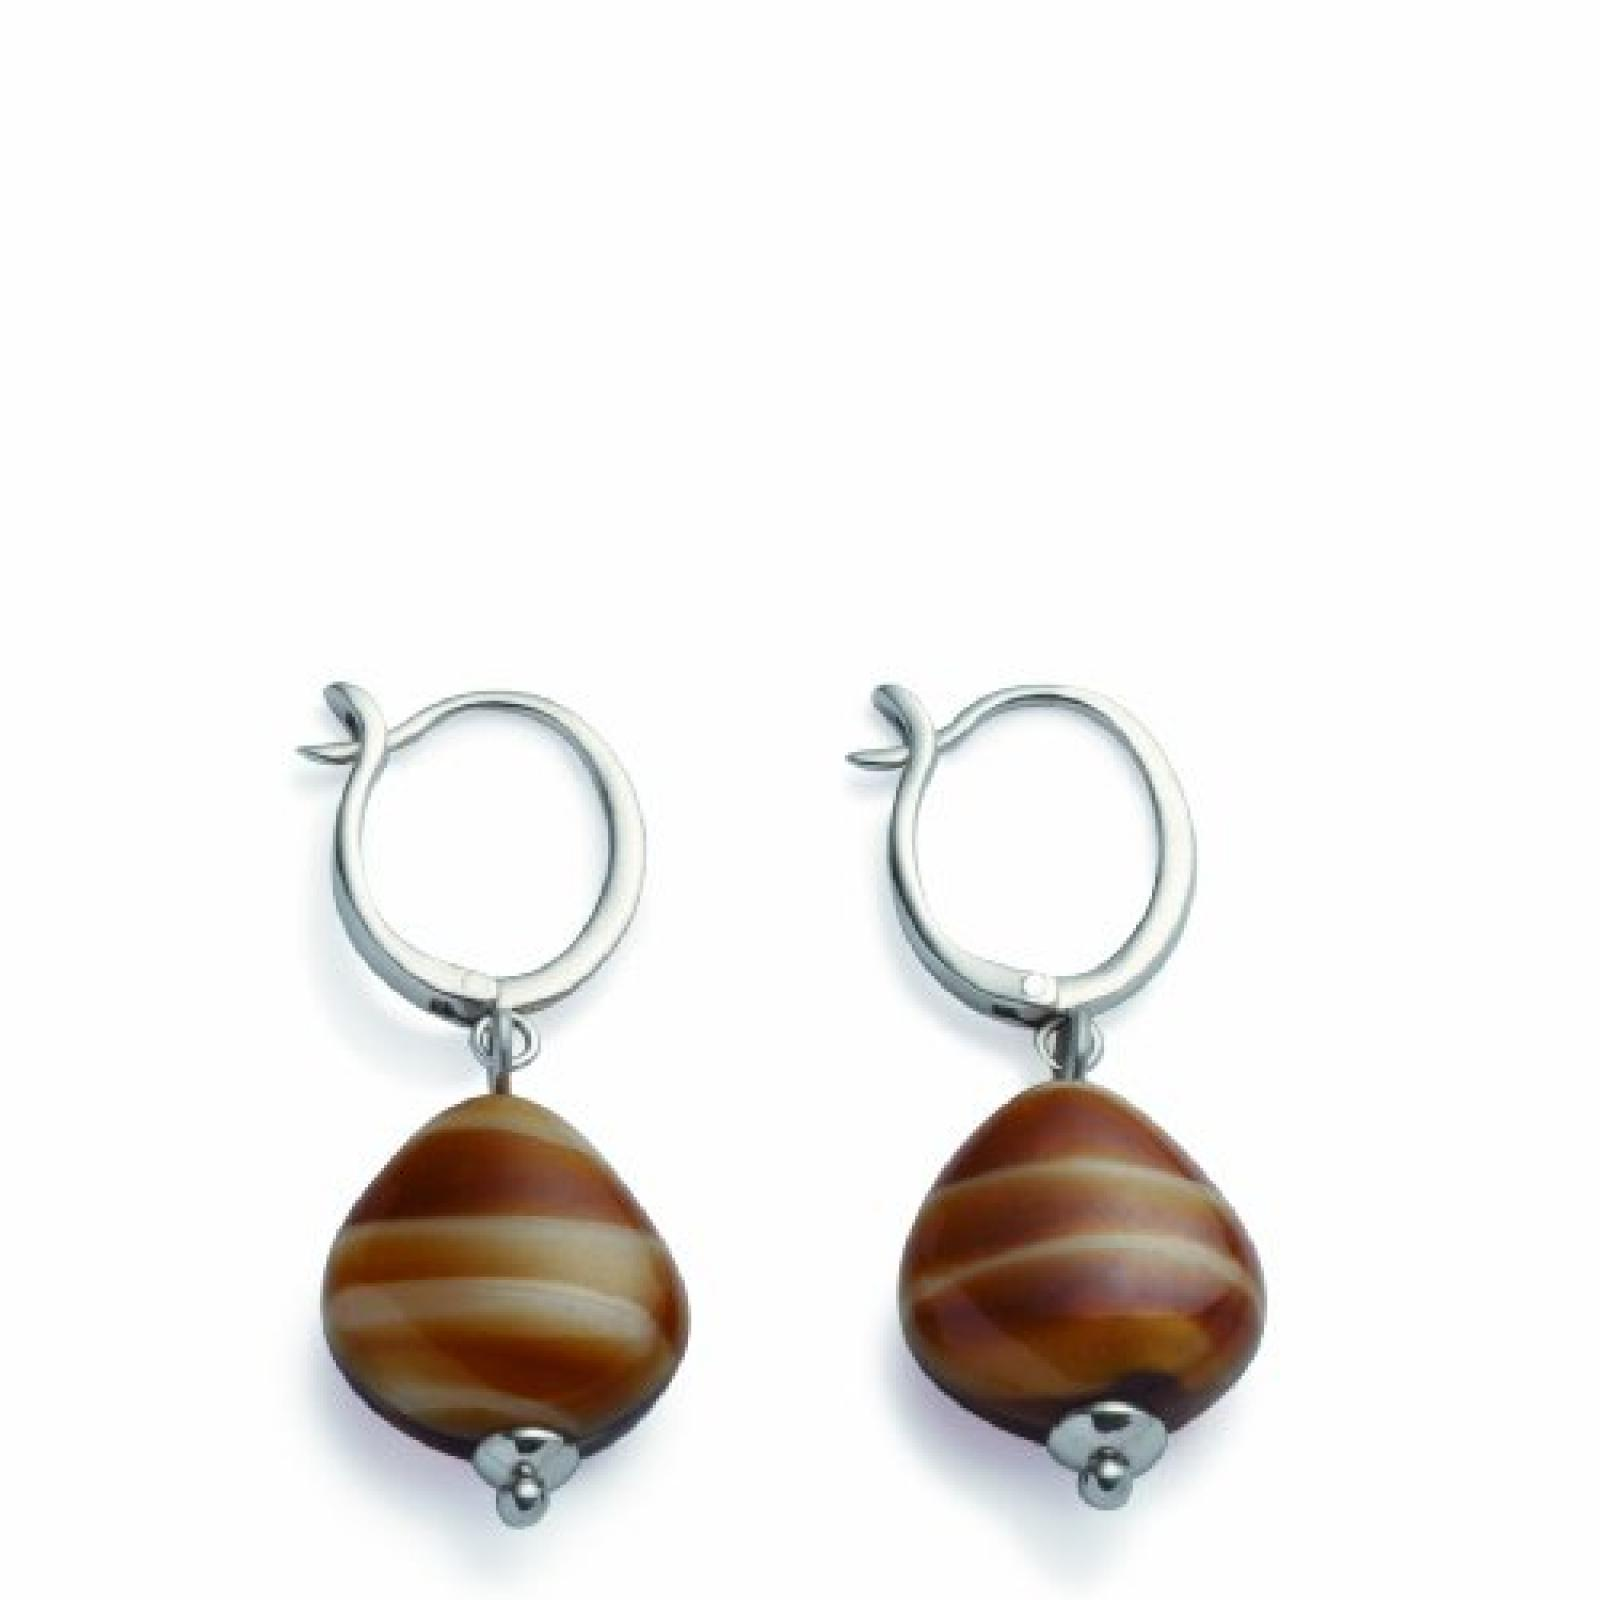 Leonardo Jewels Damen-Ohrhänger Edelstahl  centimeters 011848 Ohrhänger Brisur Spirit